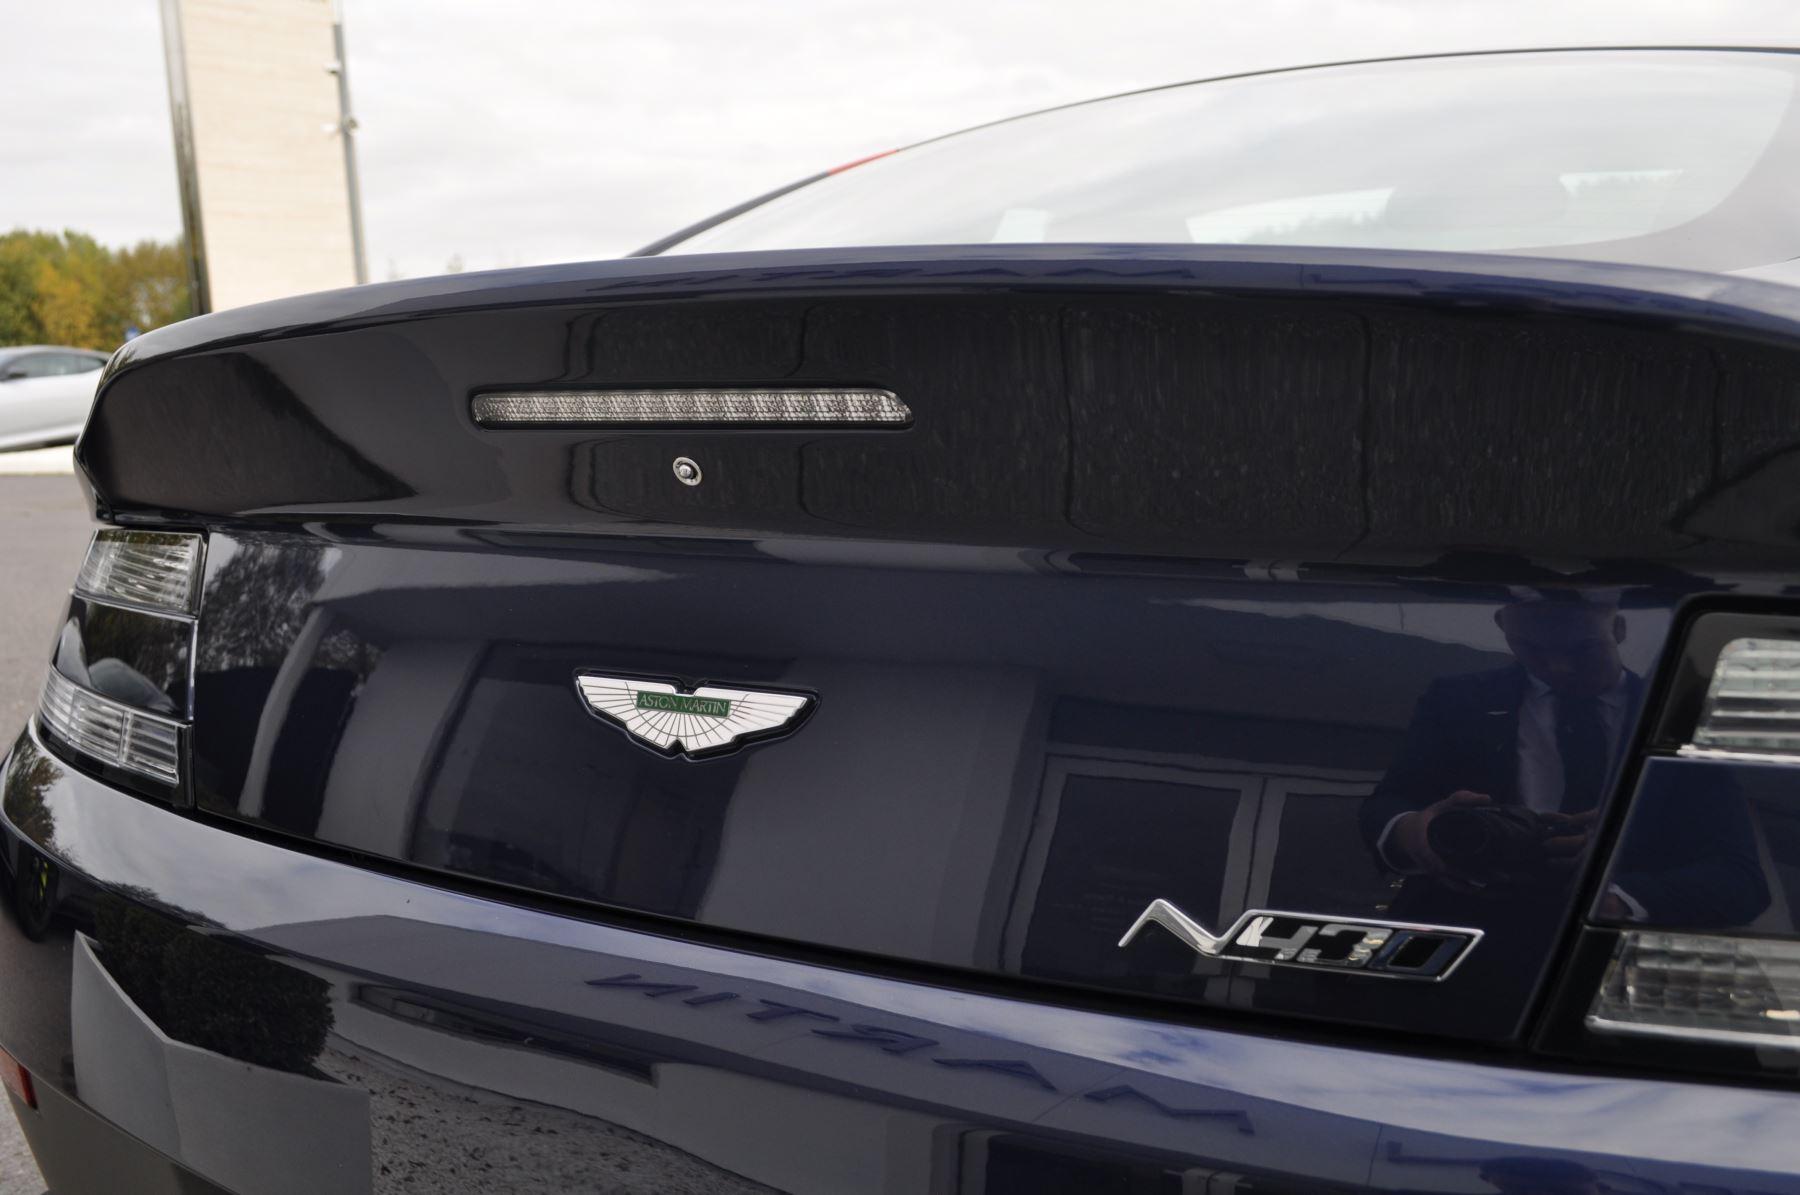 Aston Martin Vantage N430 V8 S Coupe  image 16